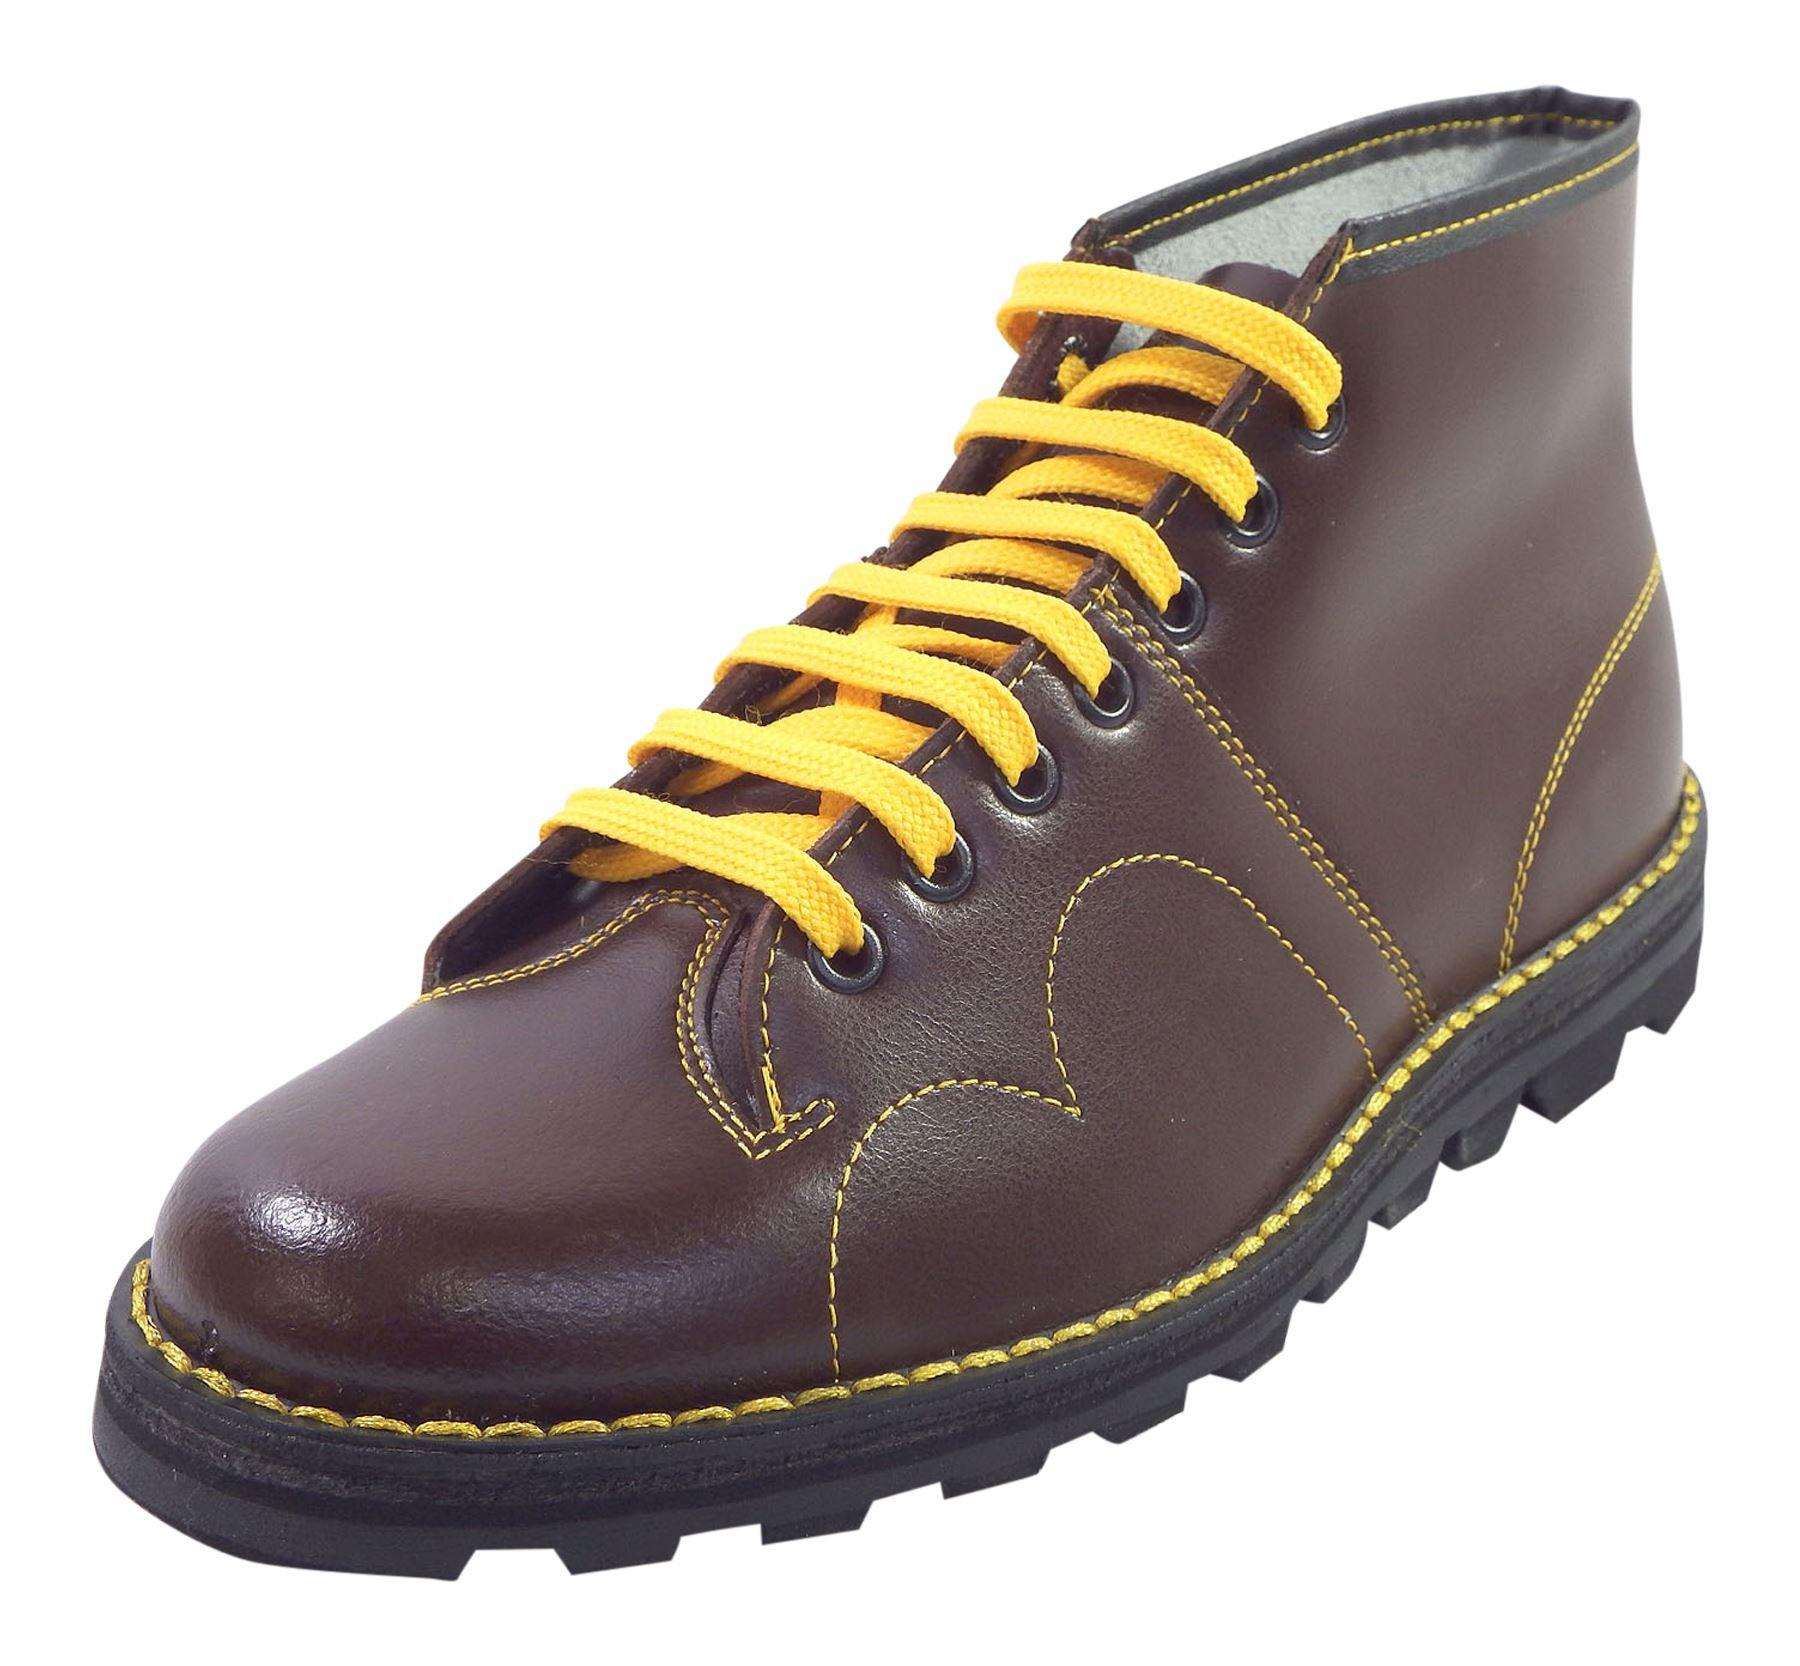 077ff58b092 Grafters Ladies / Mens Original Retro Monkey Boots | website